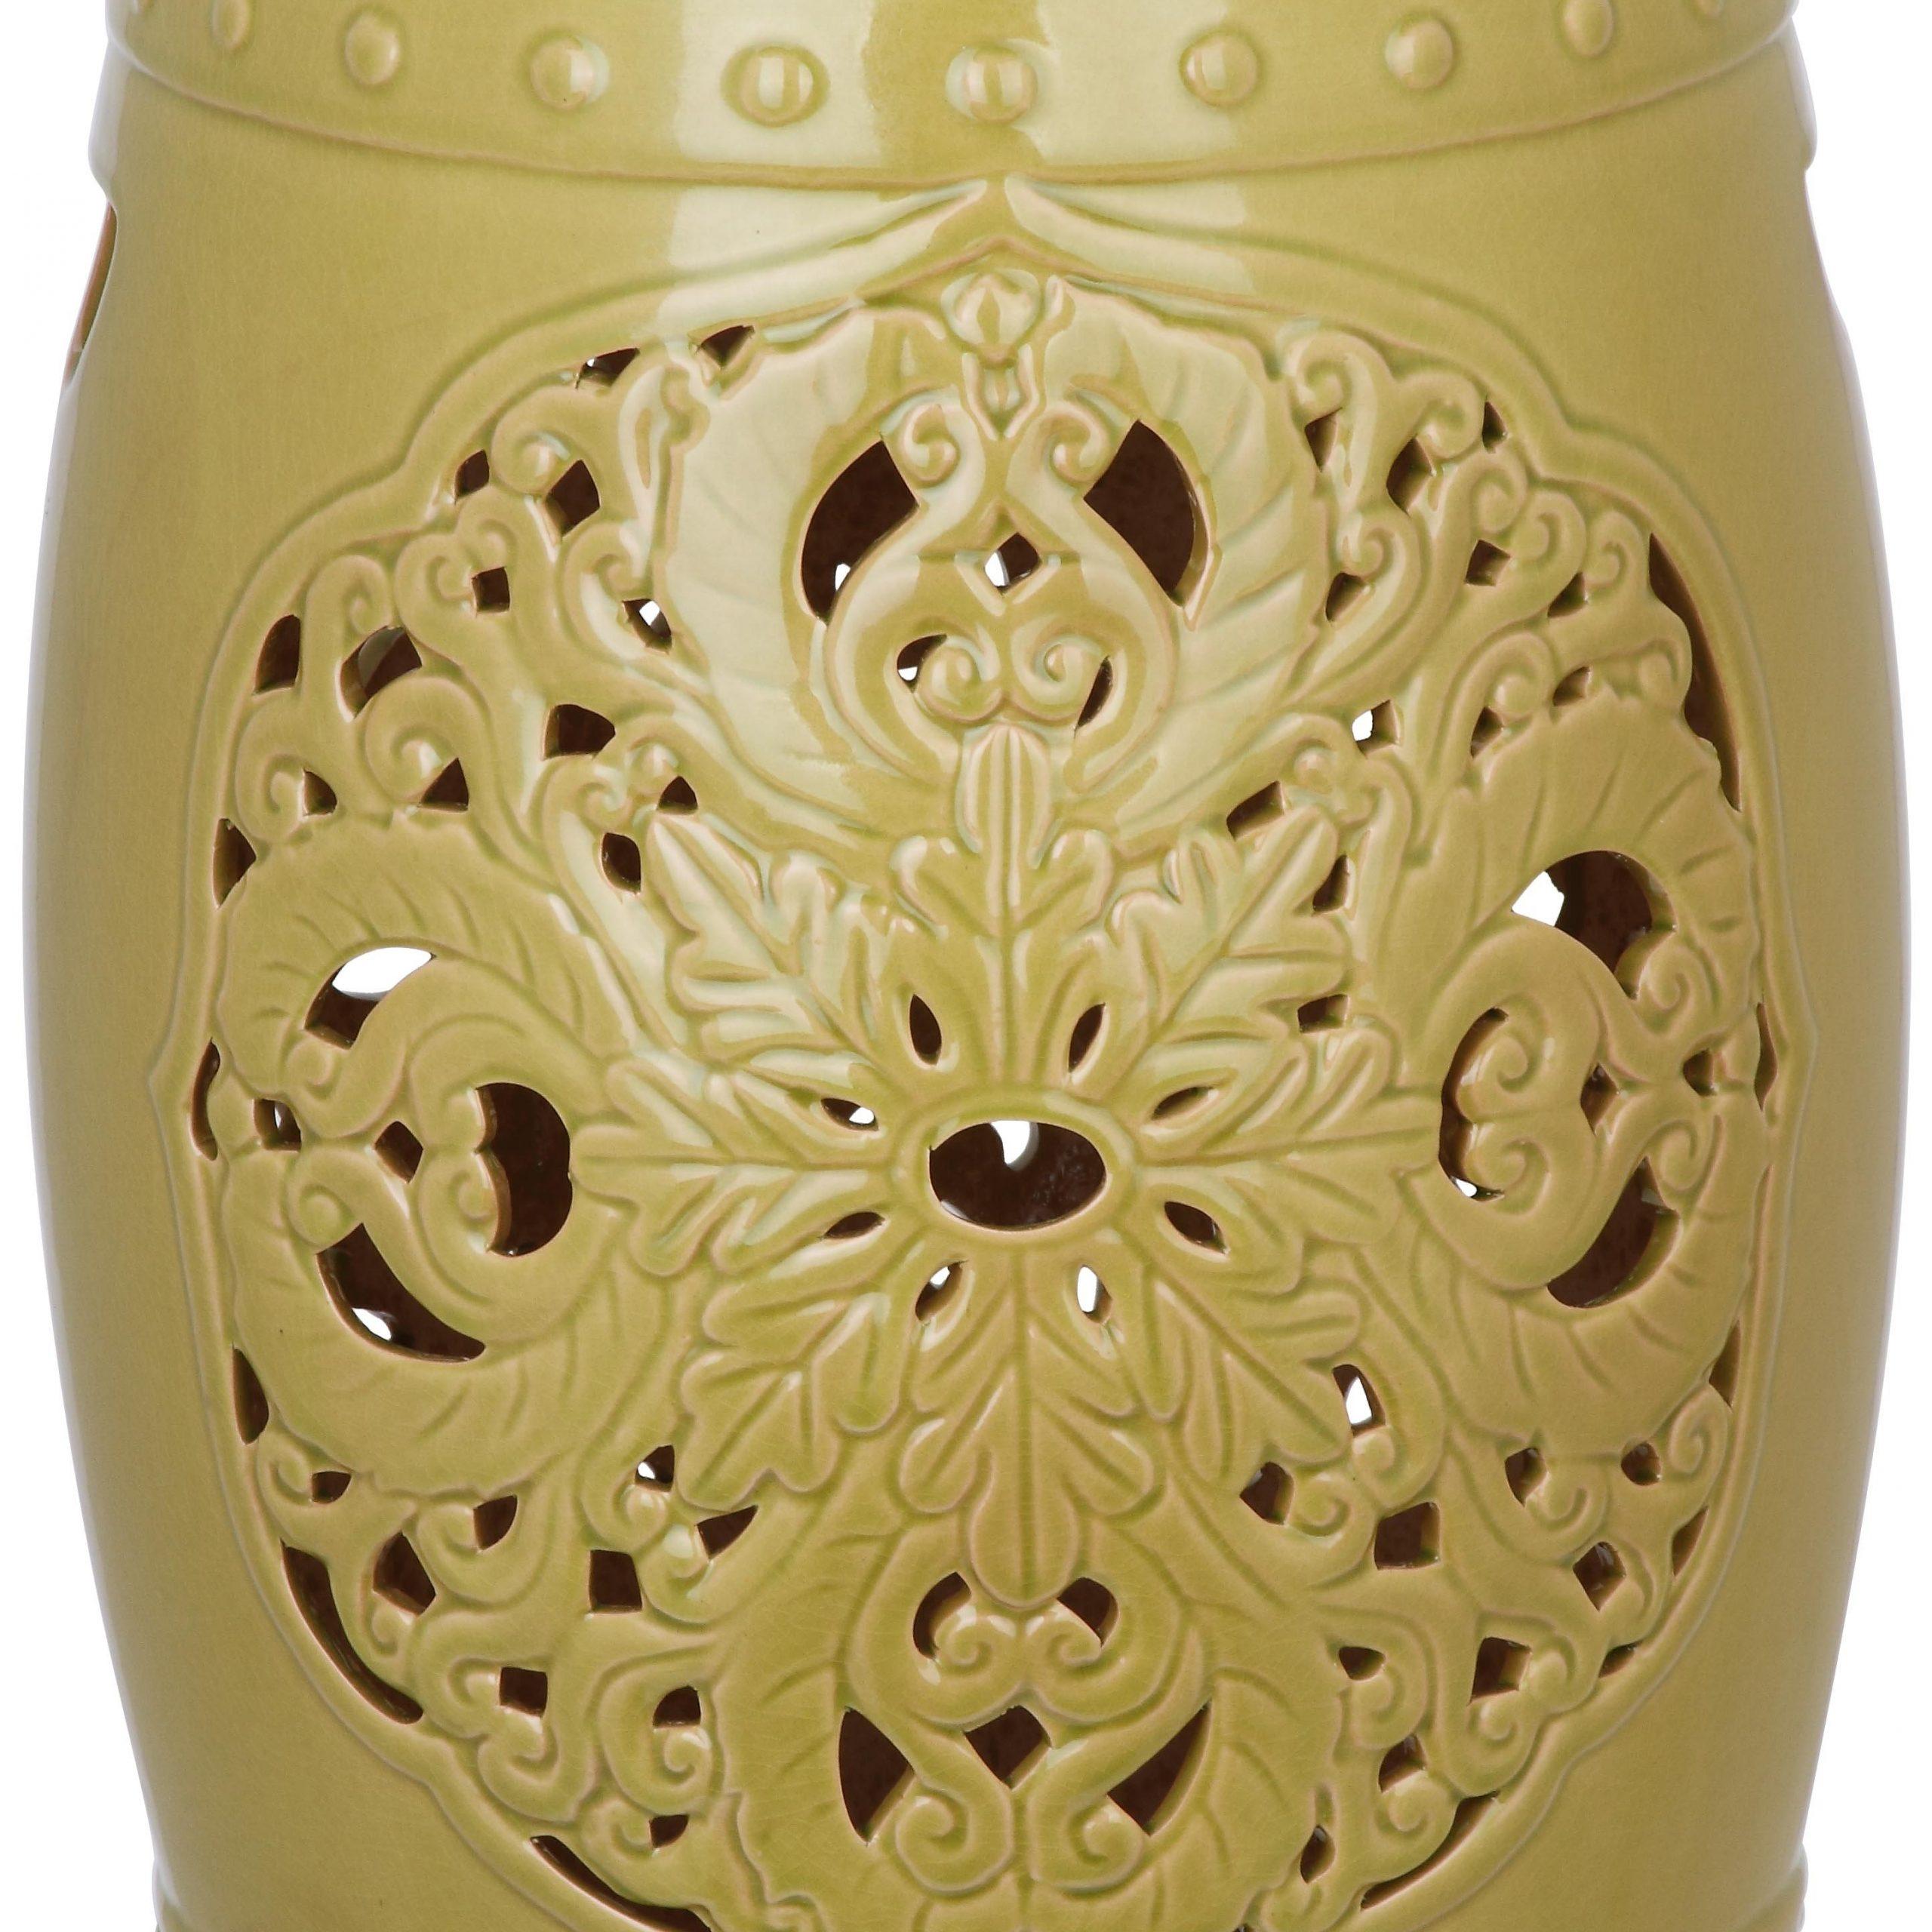 Nagle Ceramic Garden Stool In Popular Amettes Garden Stools (View 18 of 30)